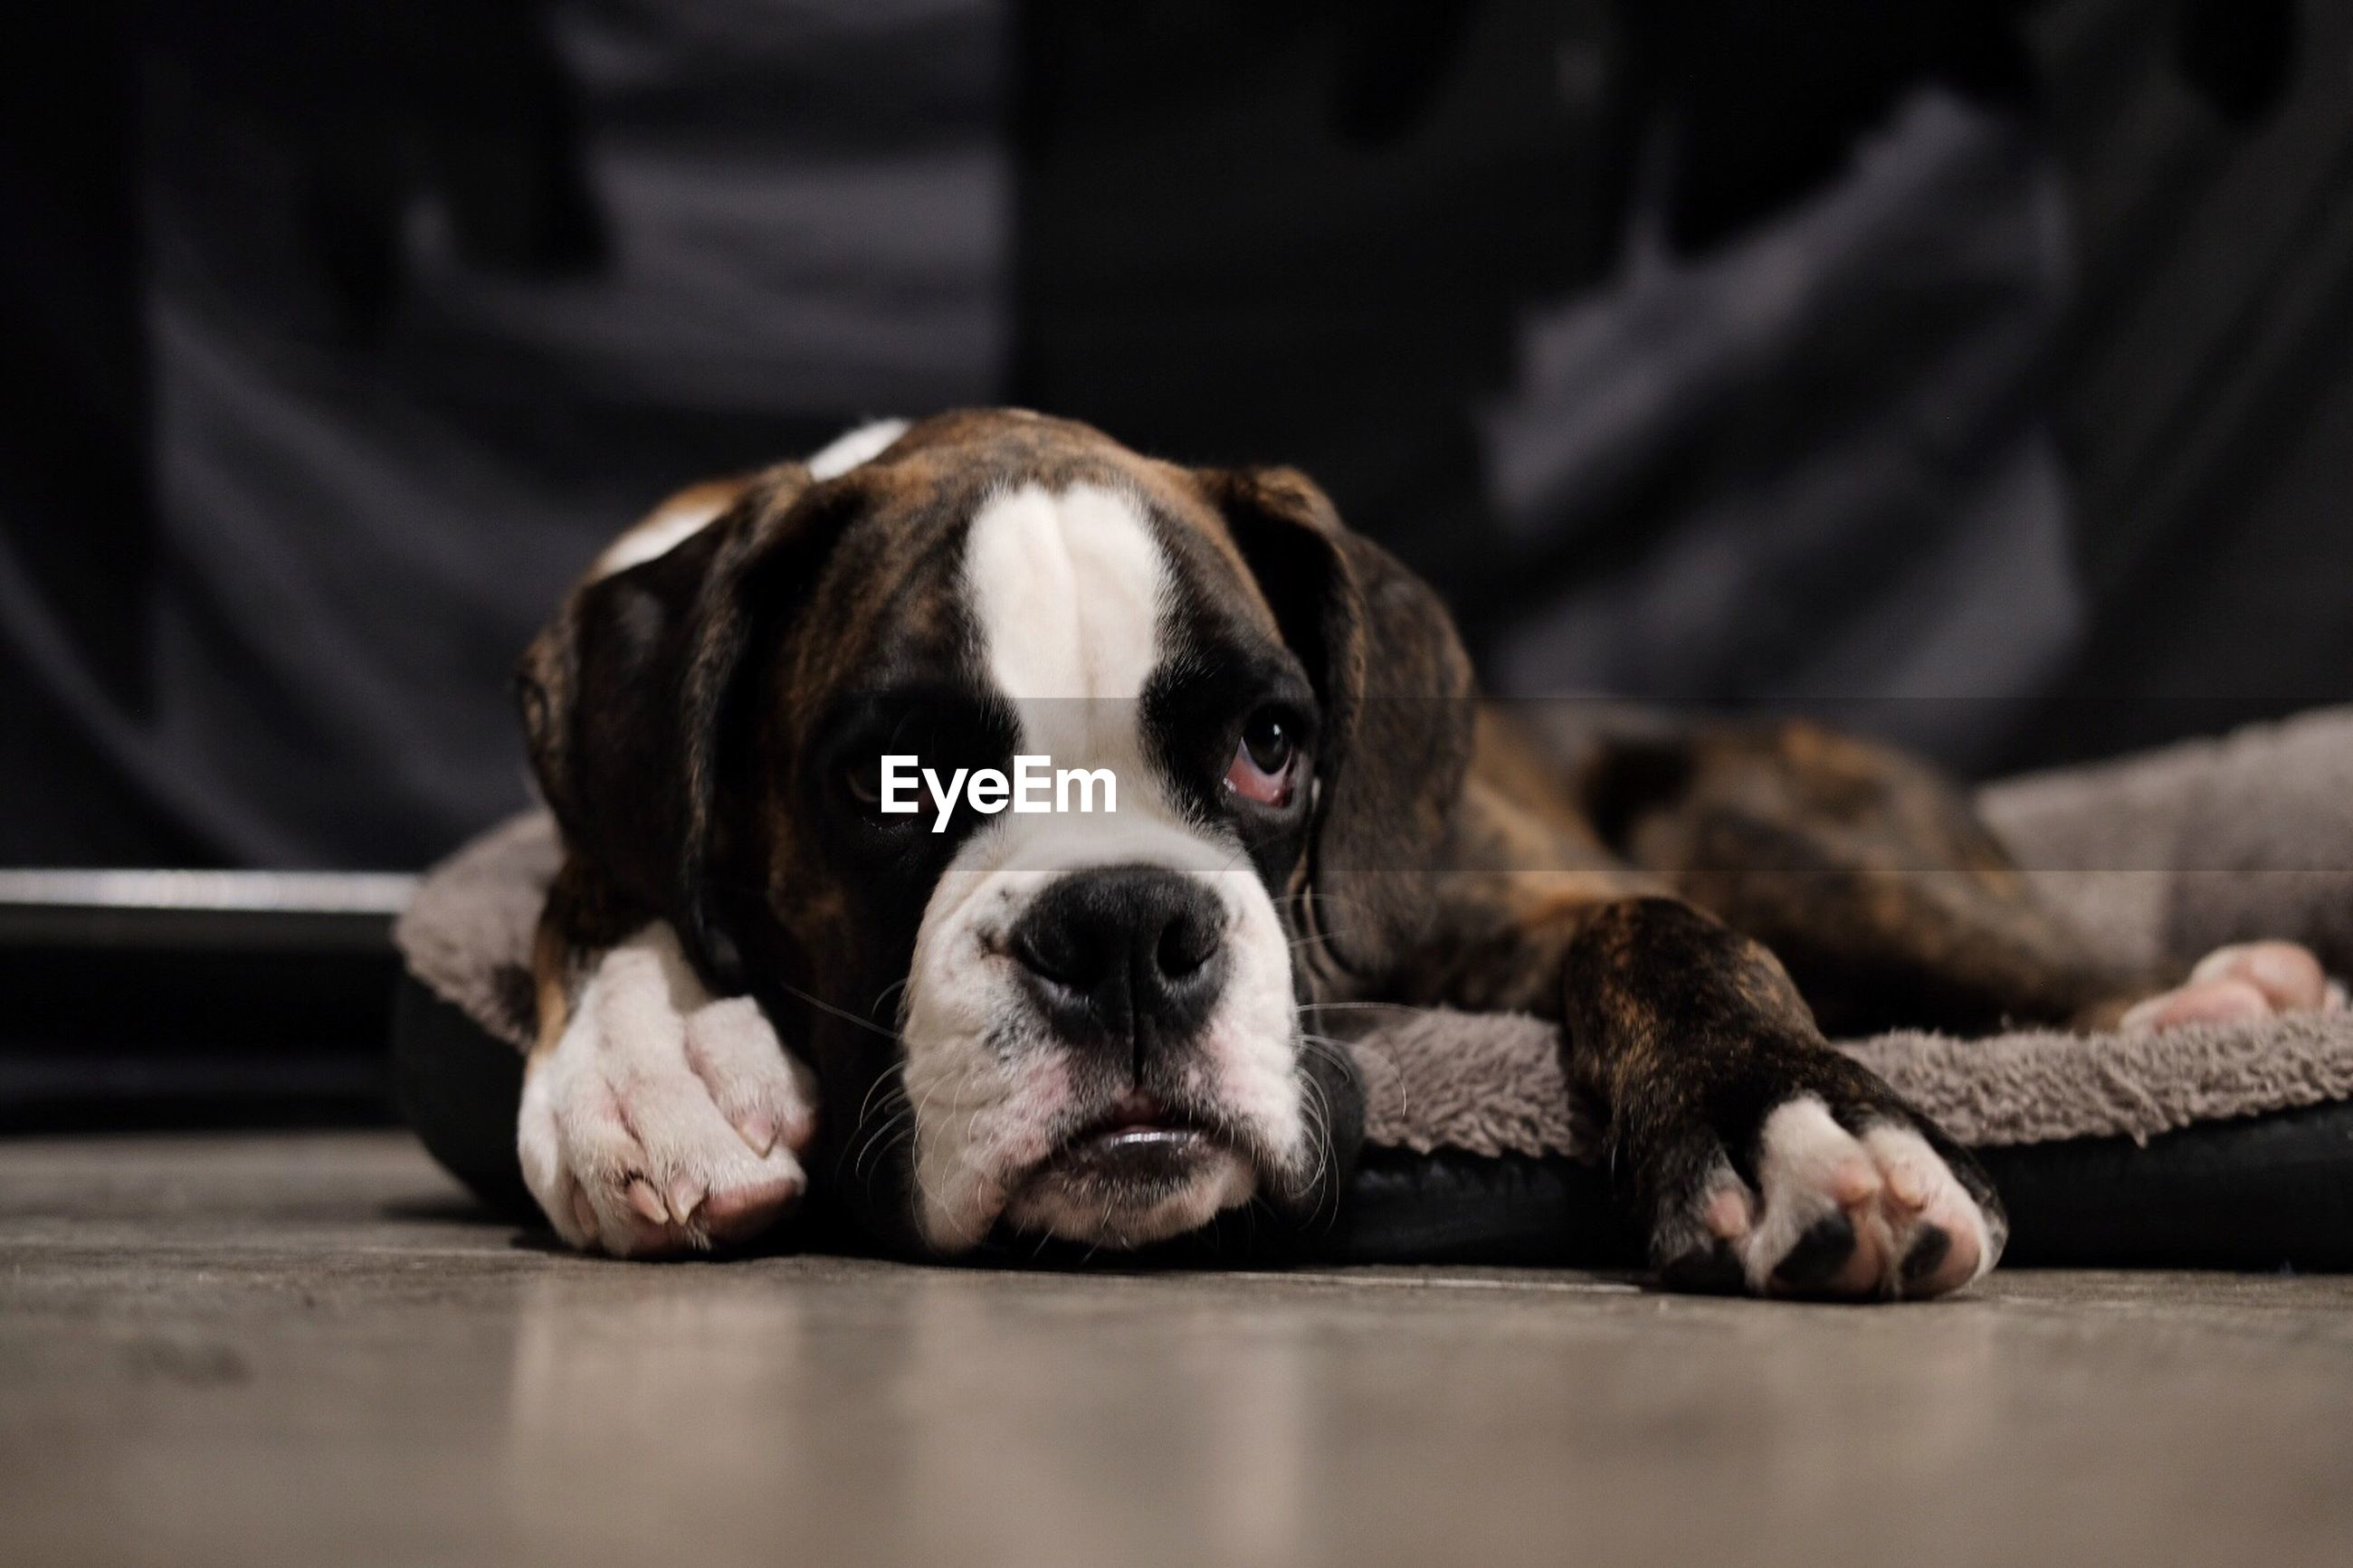 PORTRAIT OF DOG LYING ON FLOOR